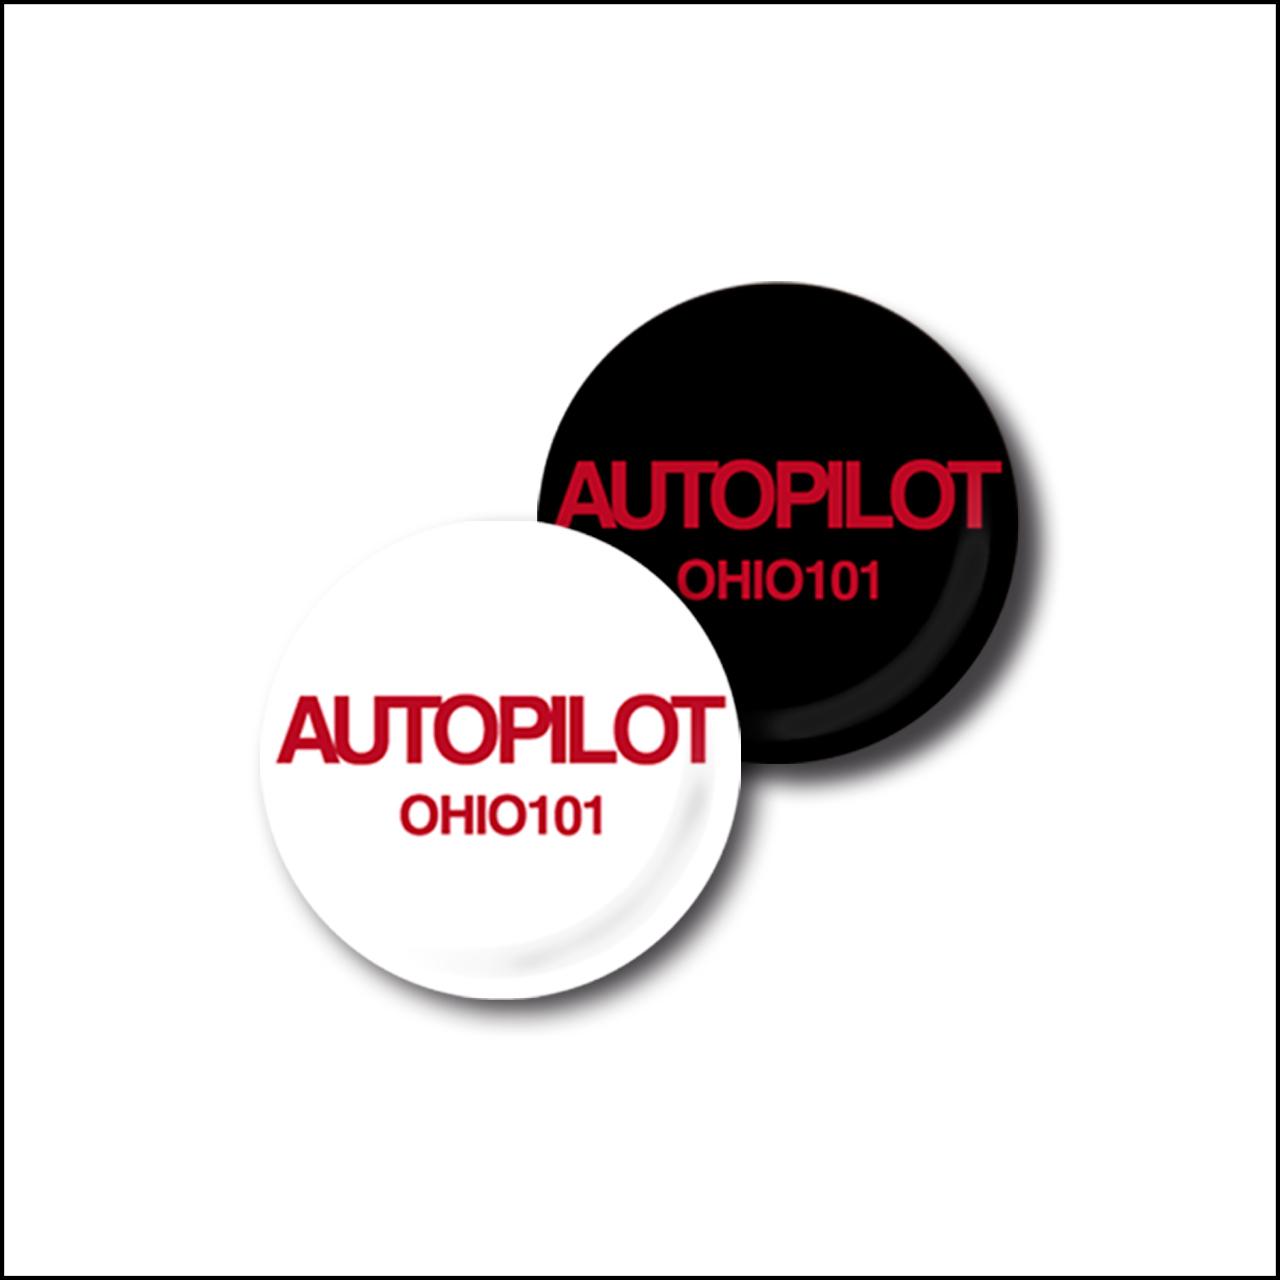 OHIO101 AUTOPILOT badge *not for sale